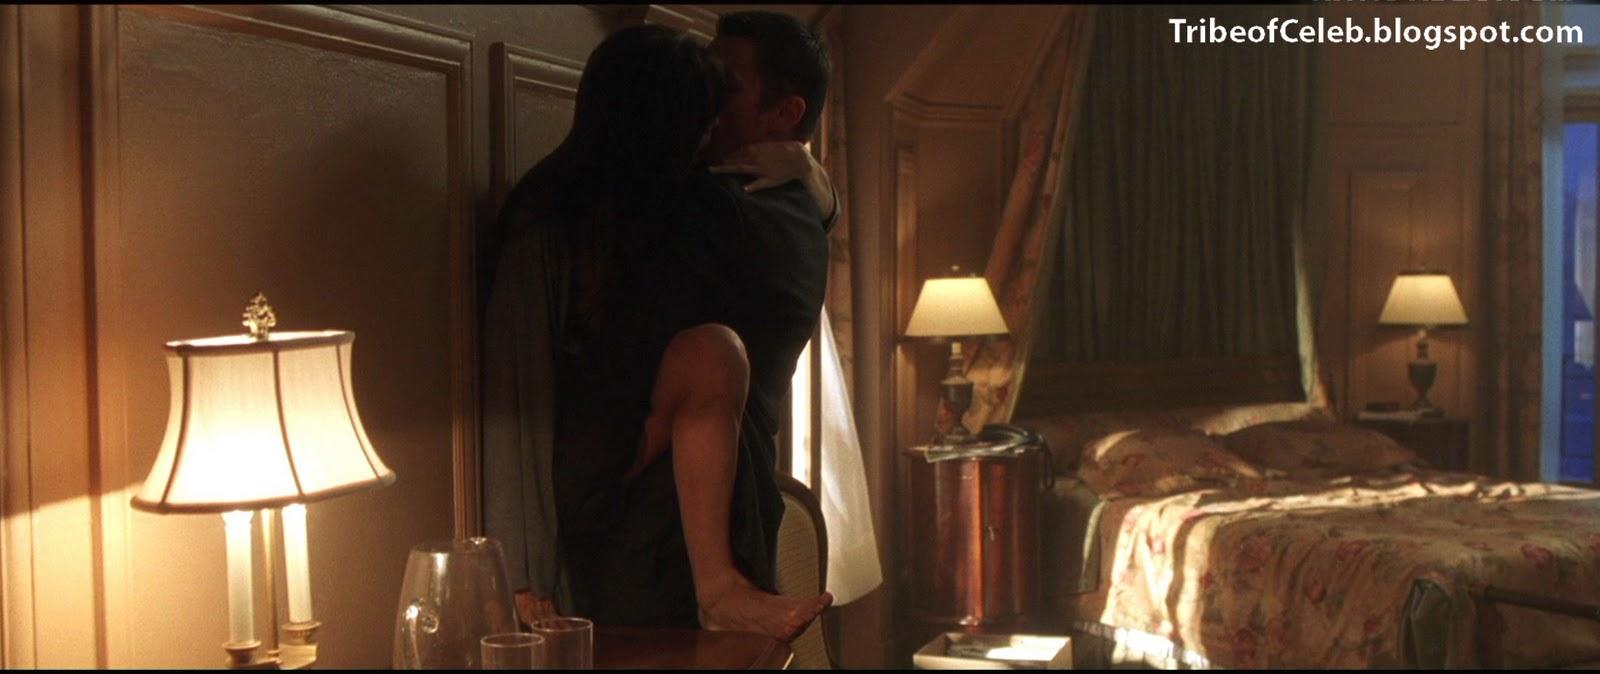 Congratulate, Angelina jolie sex scene taking lives